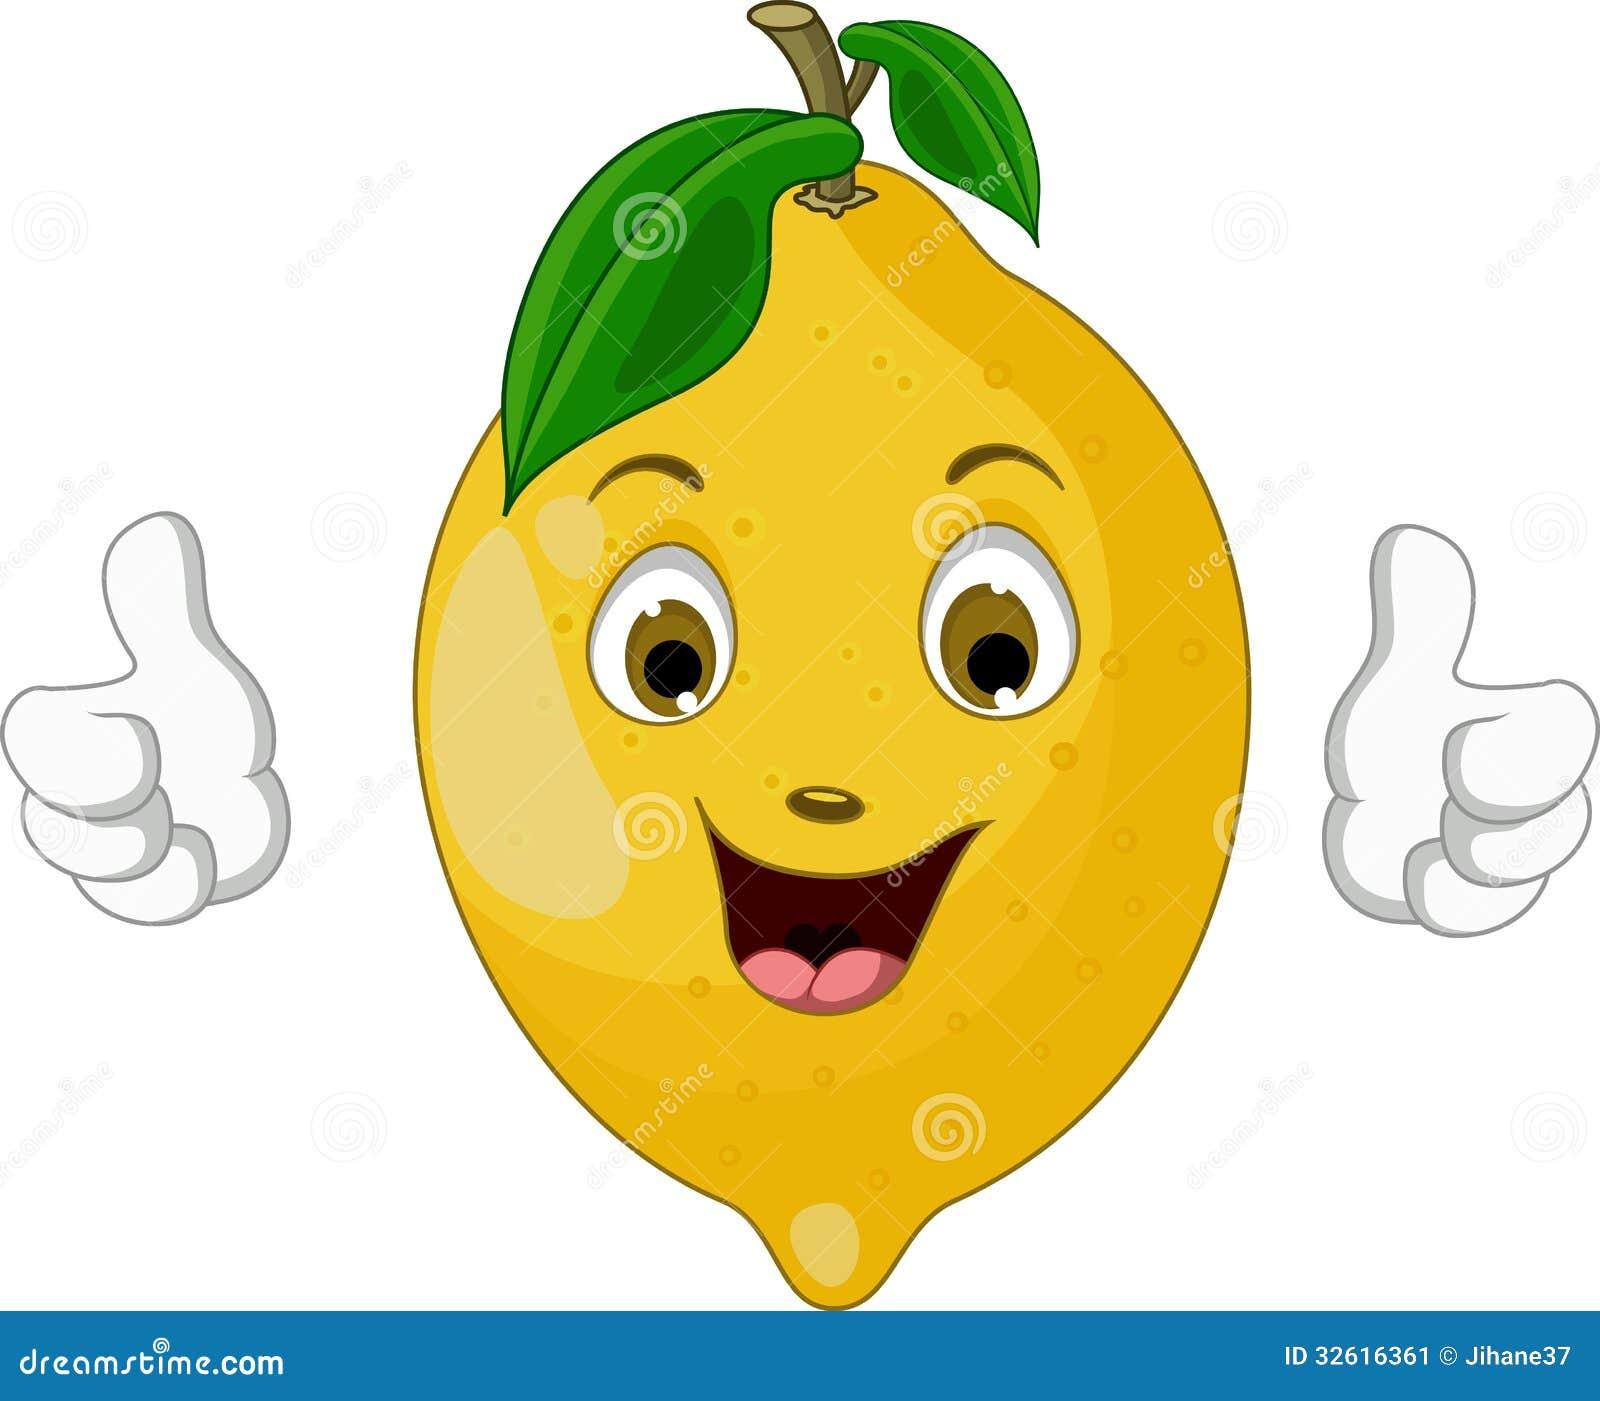 Lemon Cartoon Thumbs Up Stock Image - Image: 32616361 Wow Face Clip Art